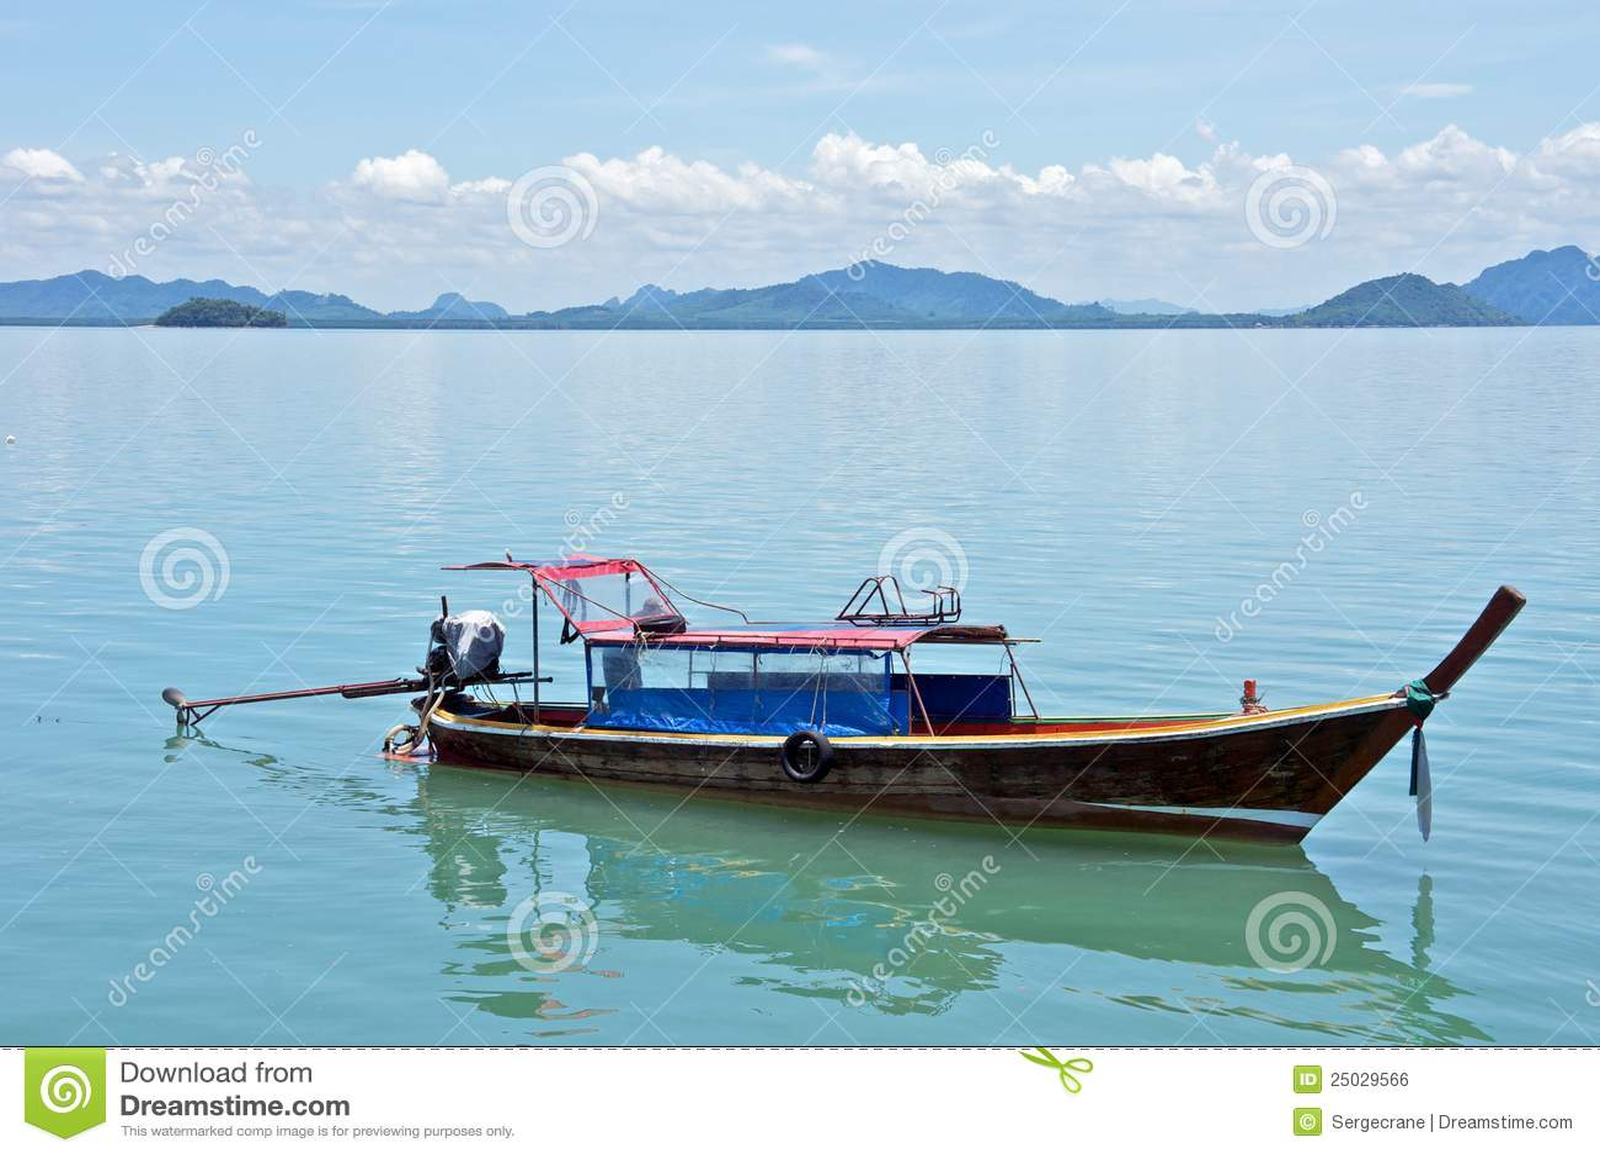 Wooden Fishing Boat Royalty Free Stock Image - Image: 25029566